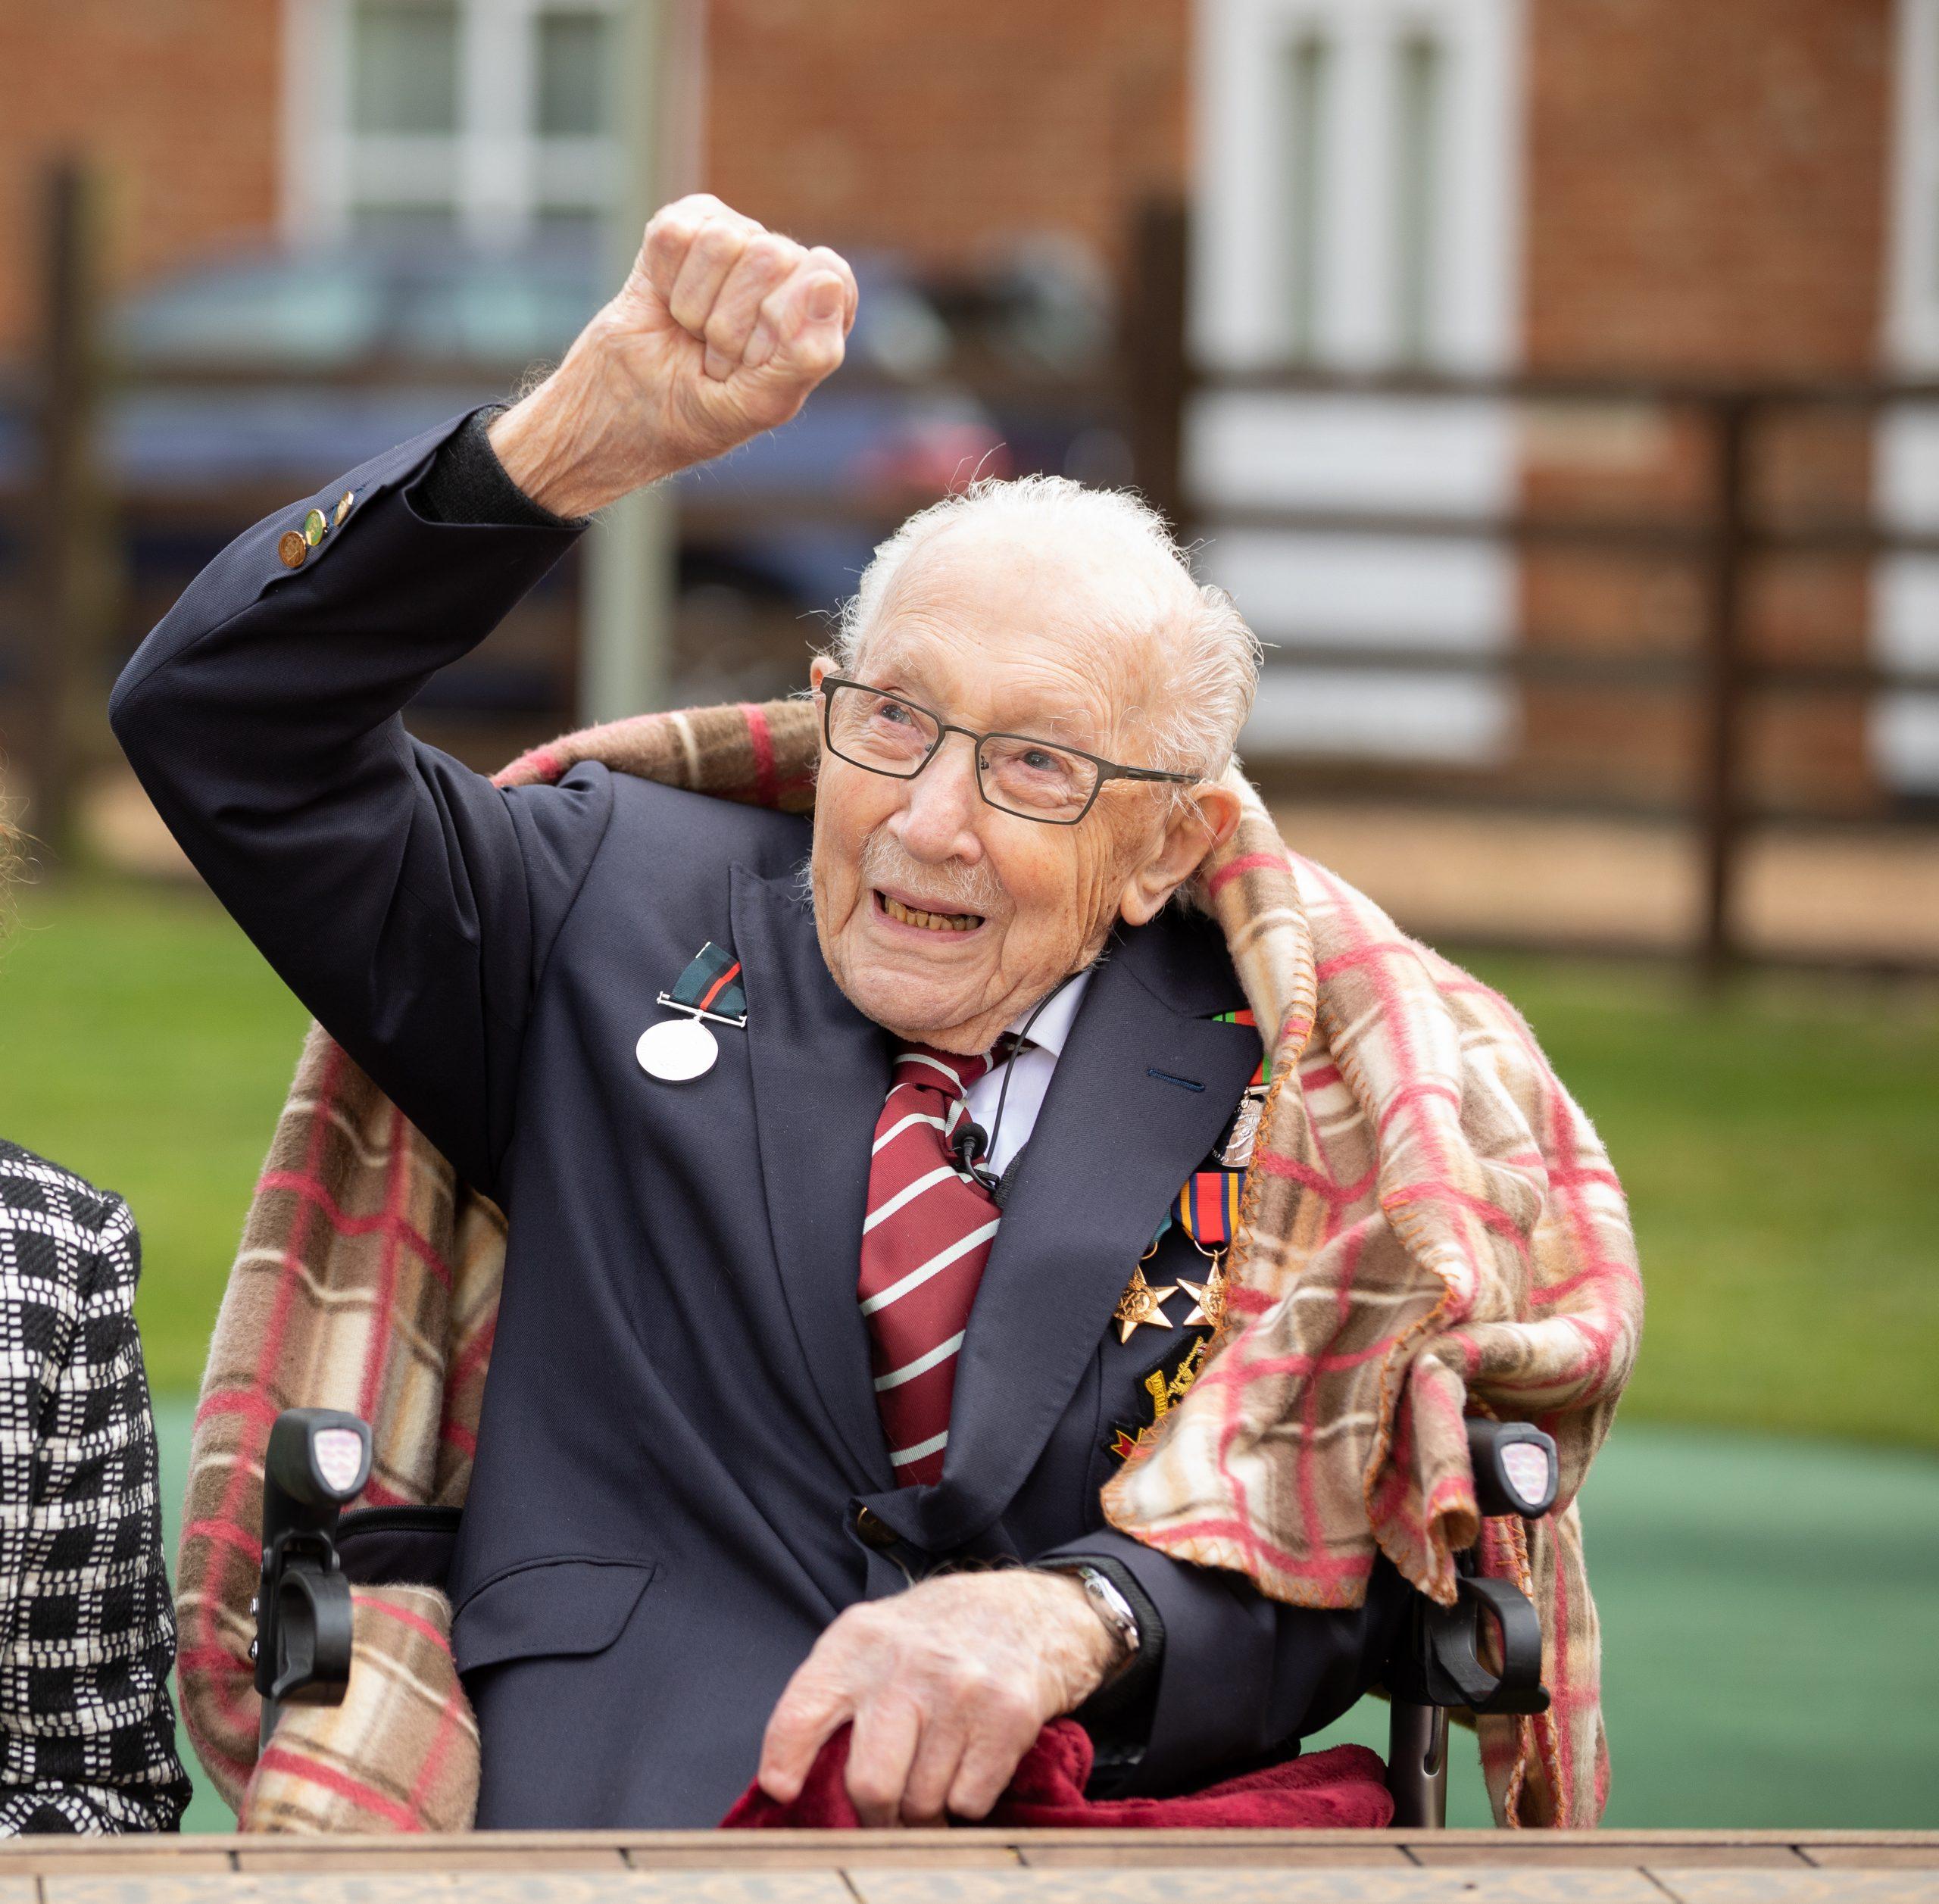 Captain Tom Moore's 100th birthday